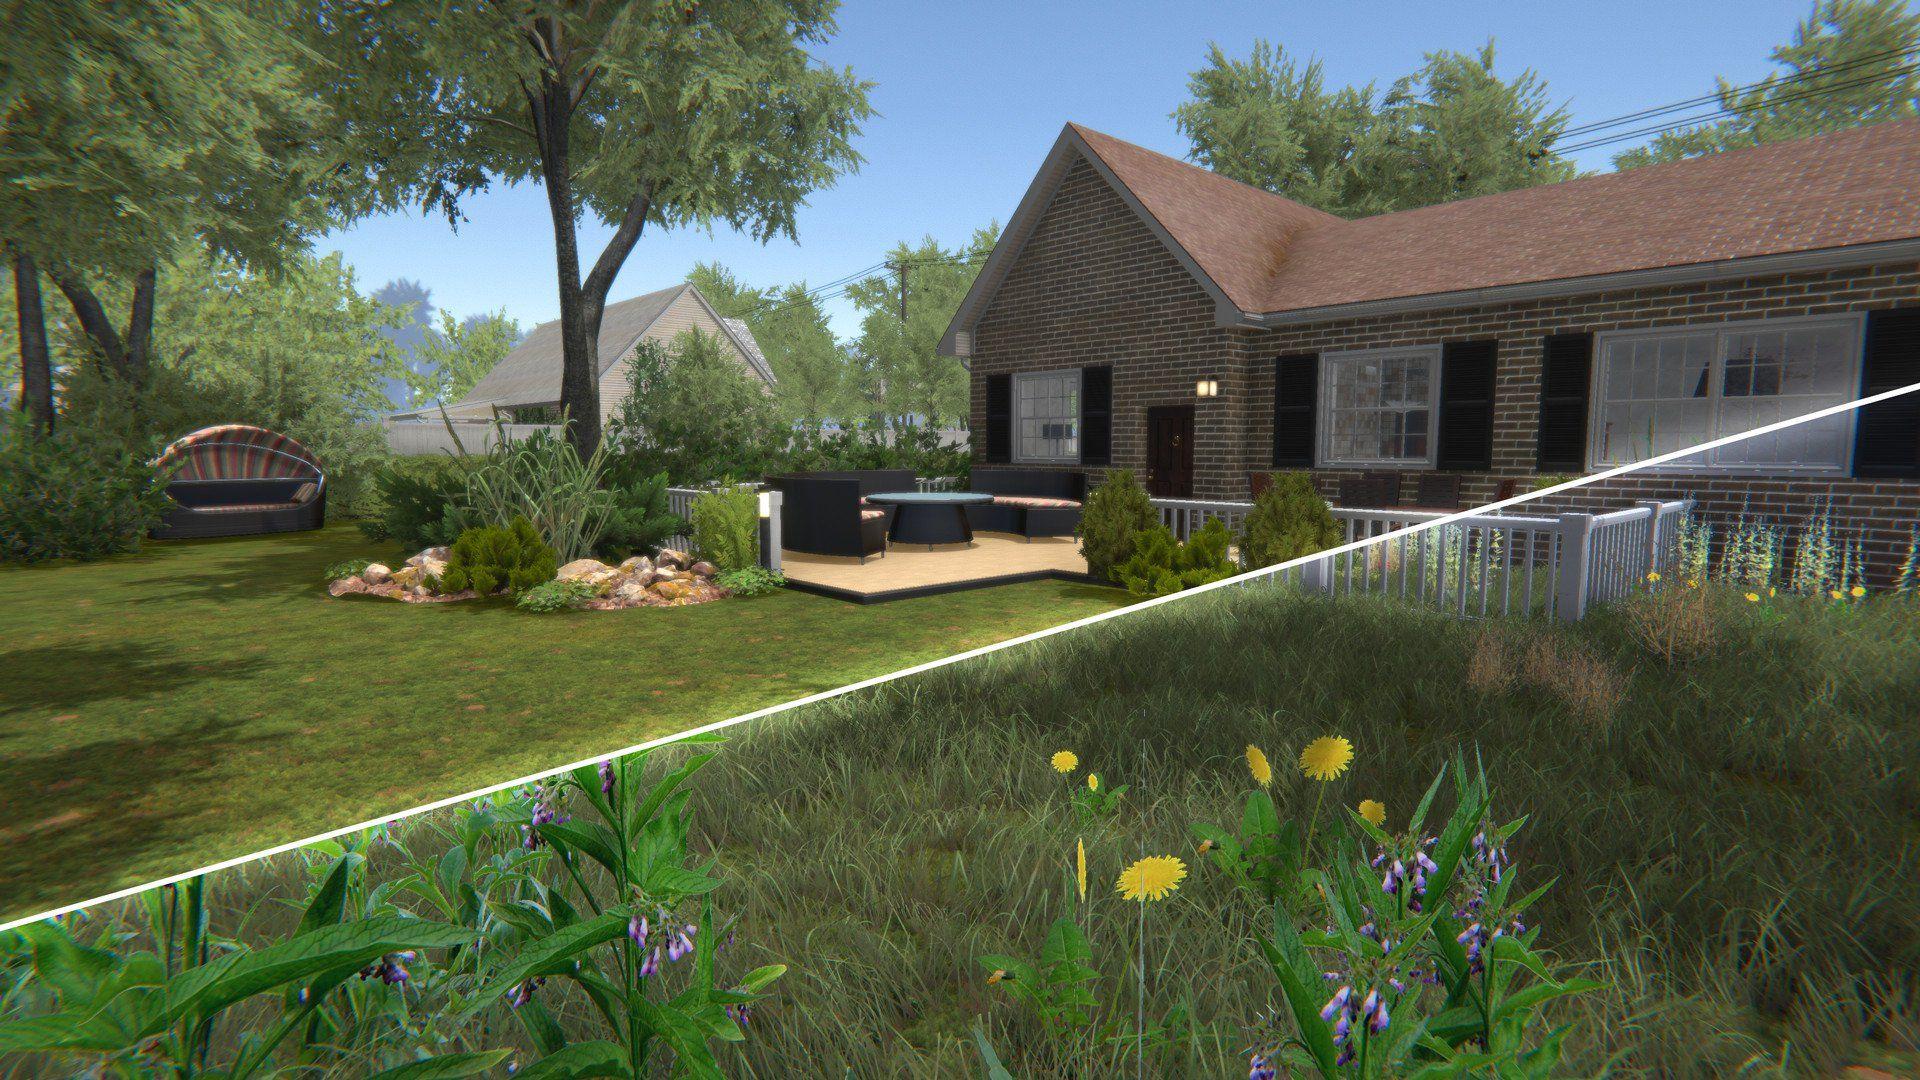 House Flipper Dlc Allows You To Flip Gardens House Flippers Garden Tree House Garden Design